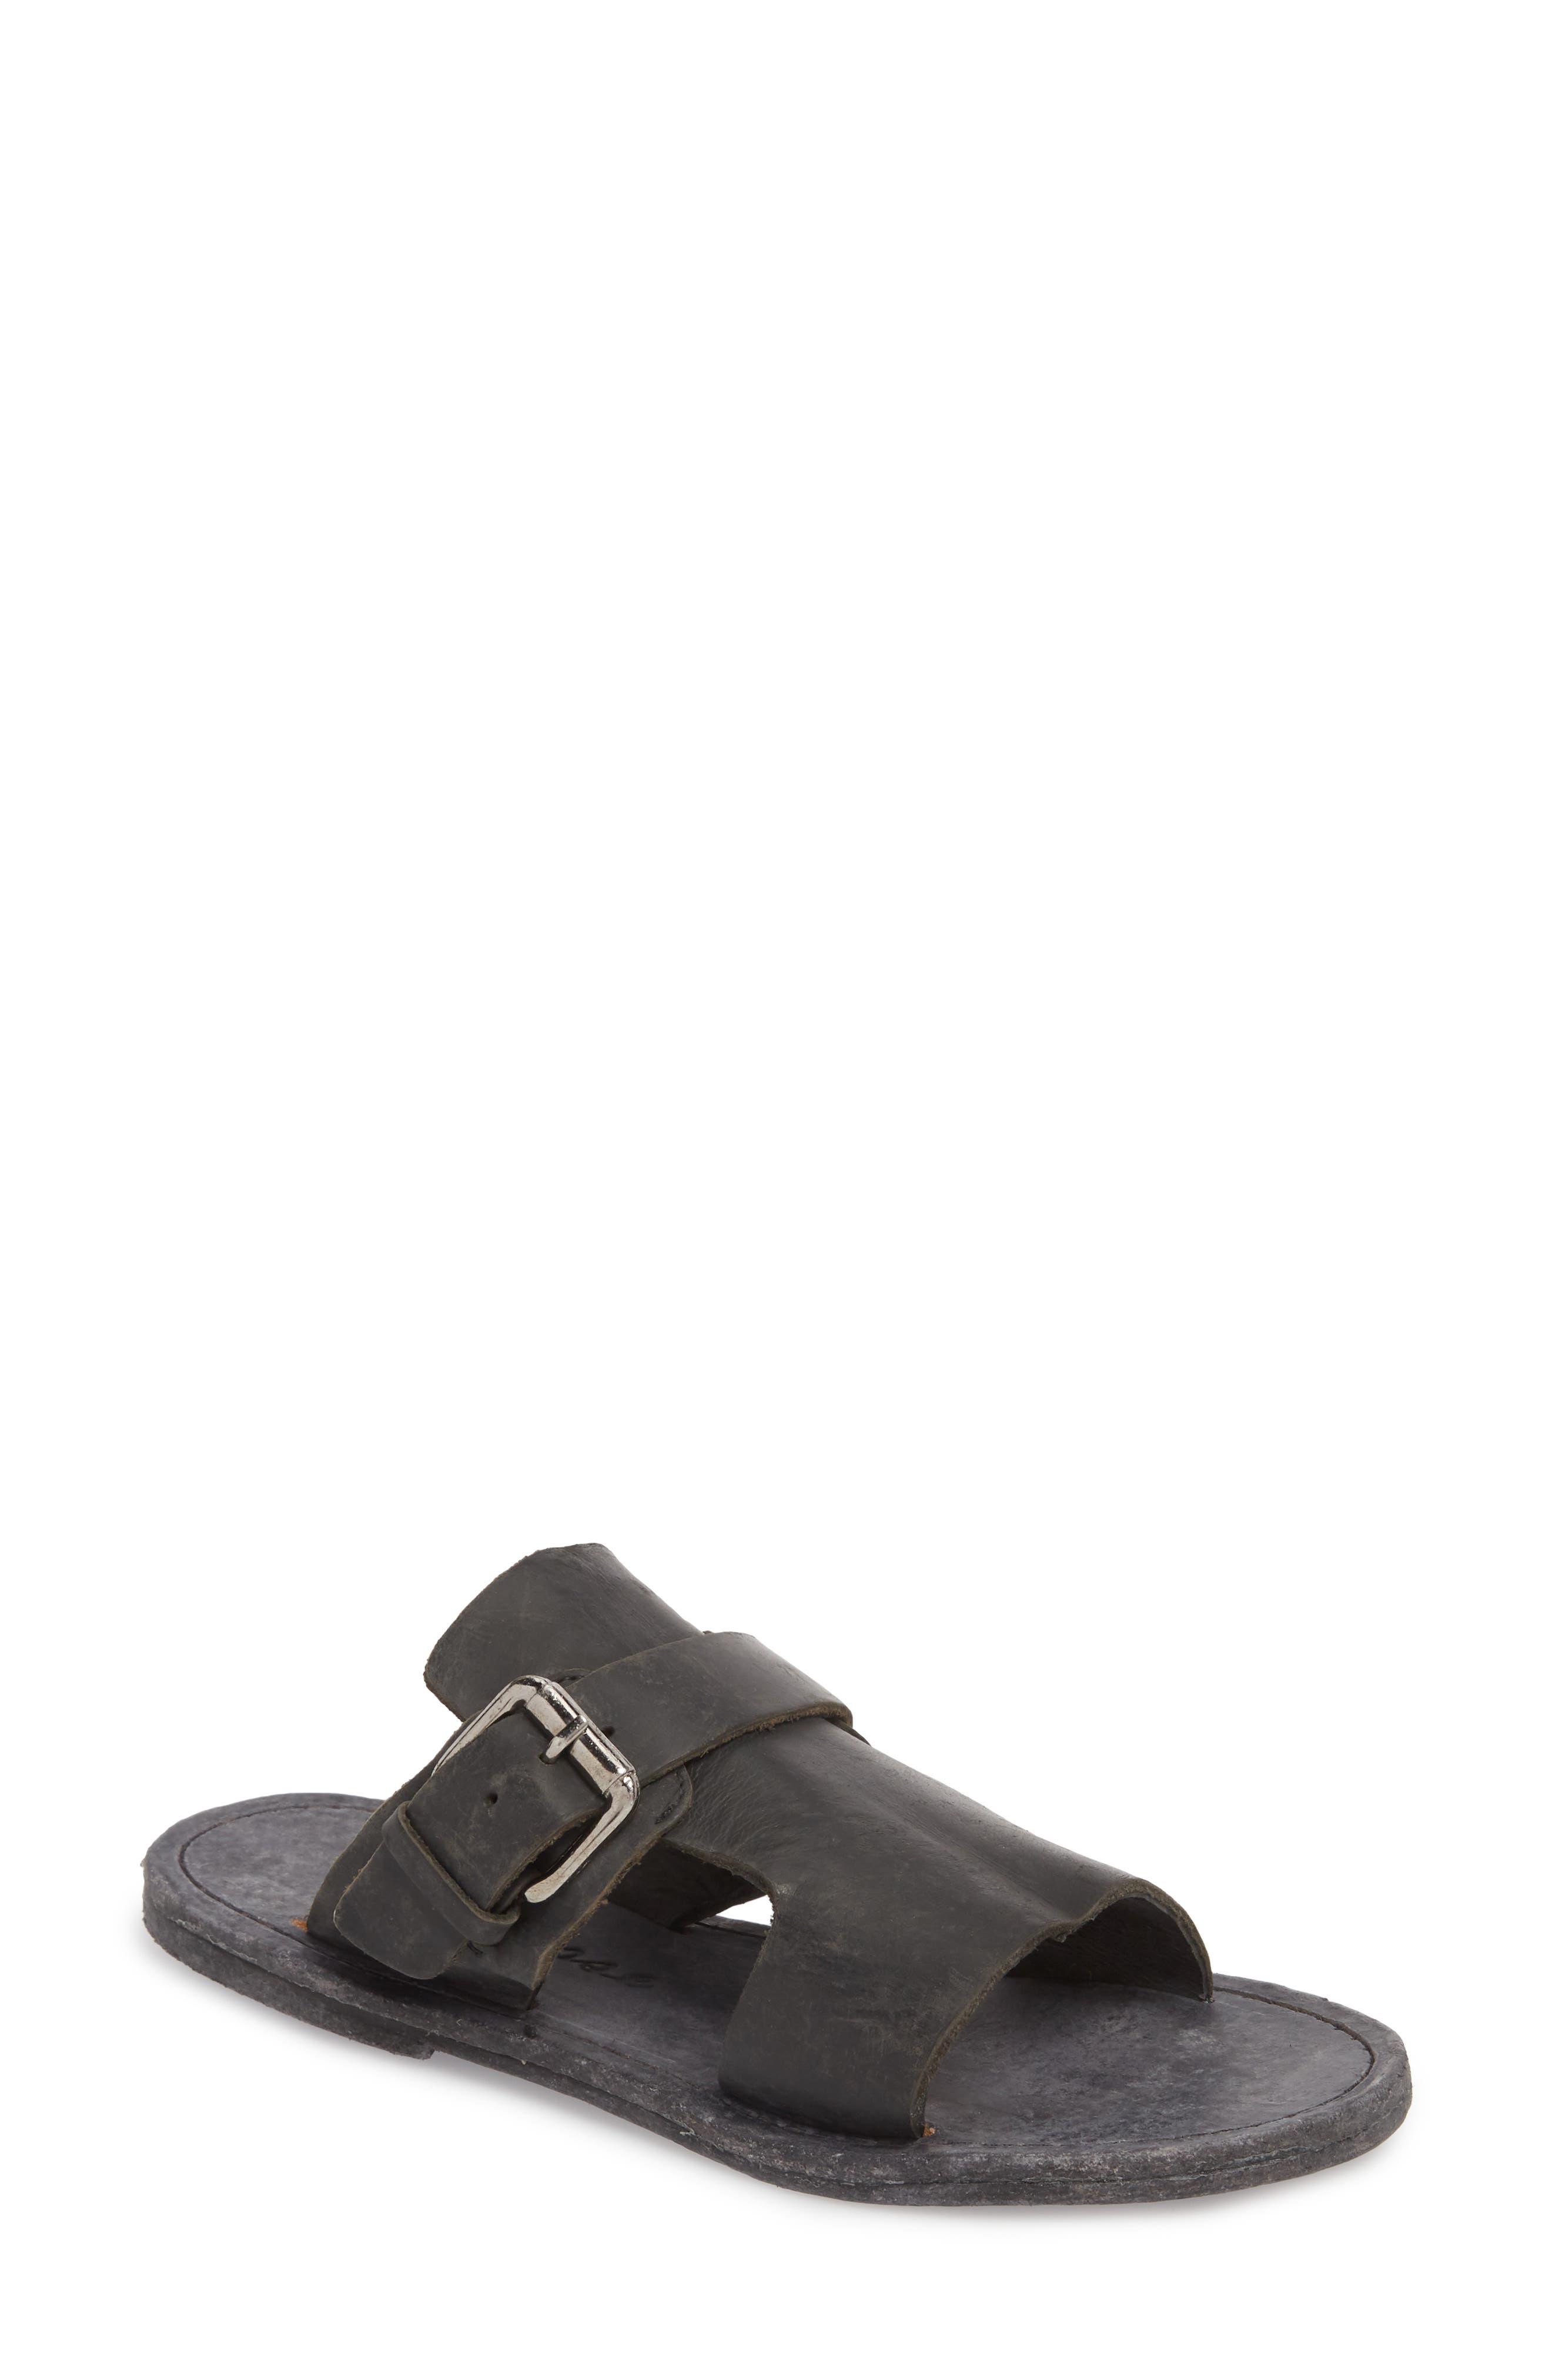 Abbie Slide Sandal,                             Main thumbnail 1, color,                             BLACK LEATHER